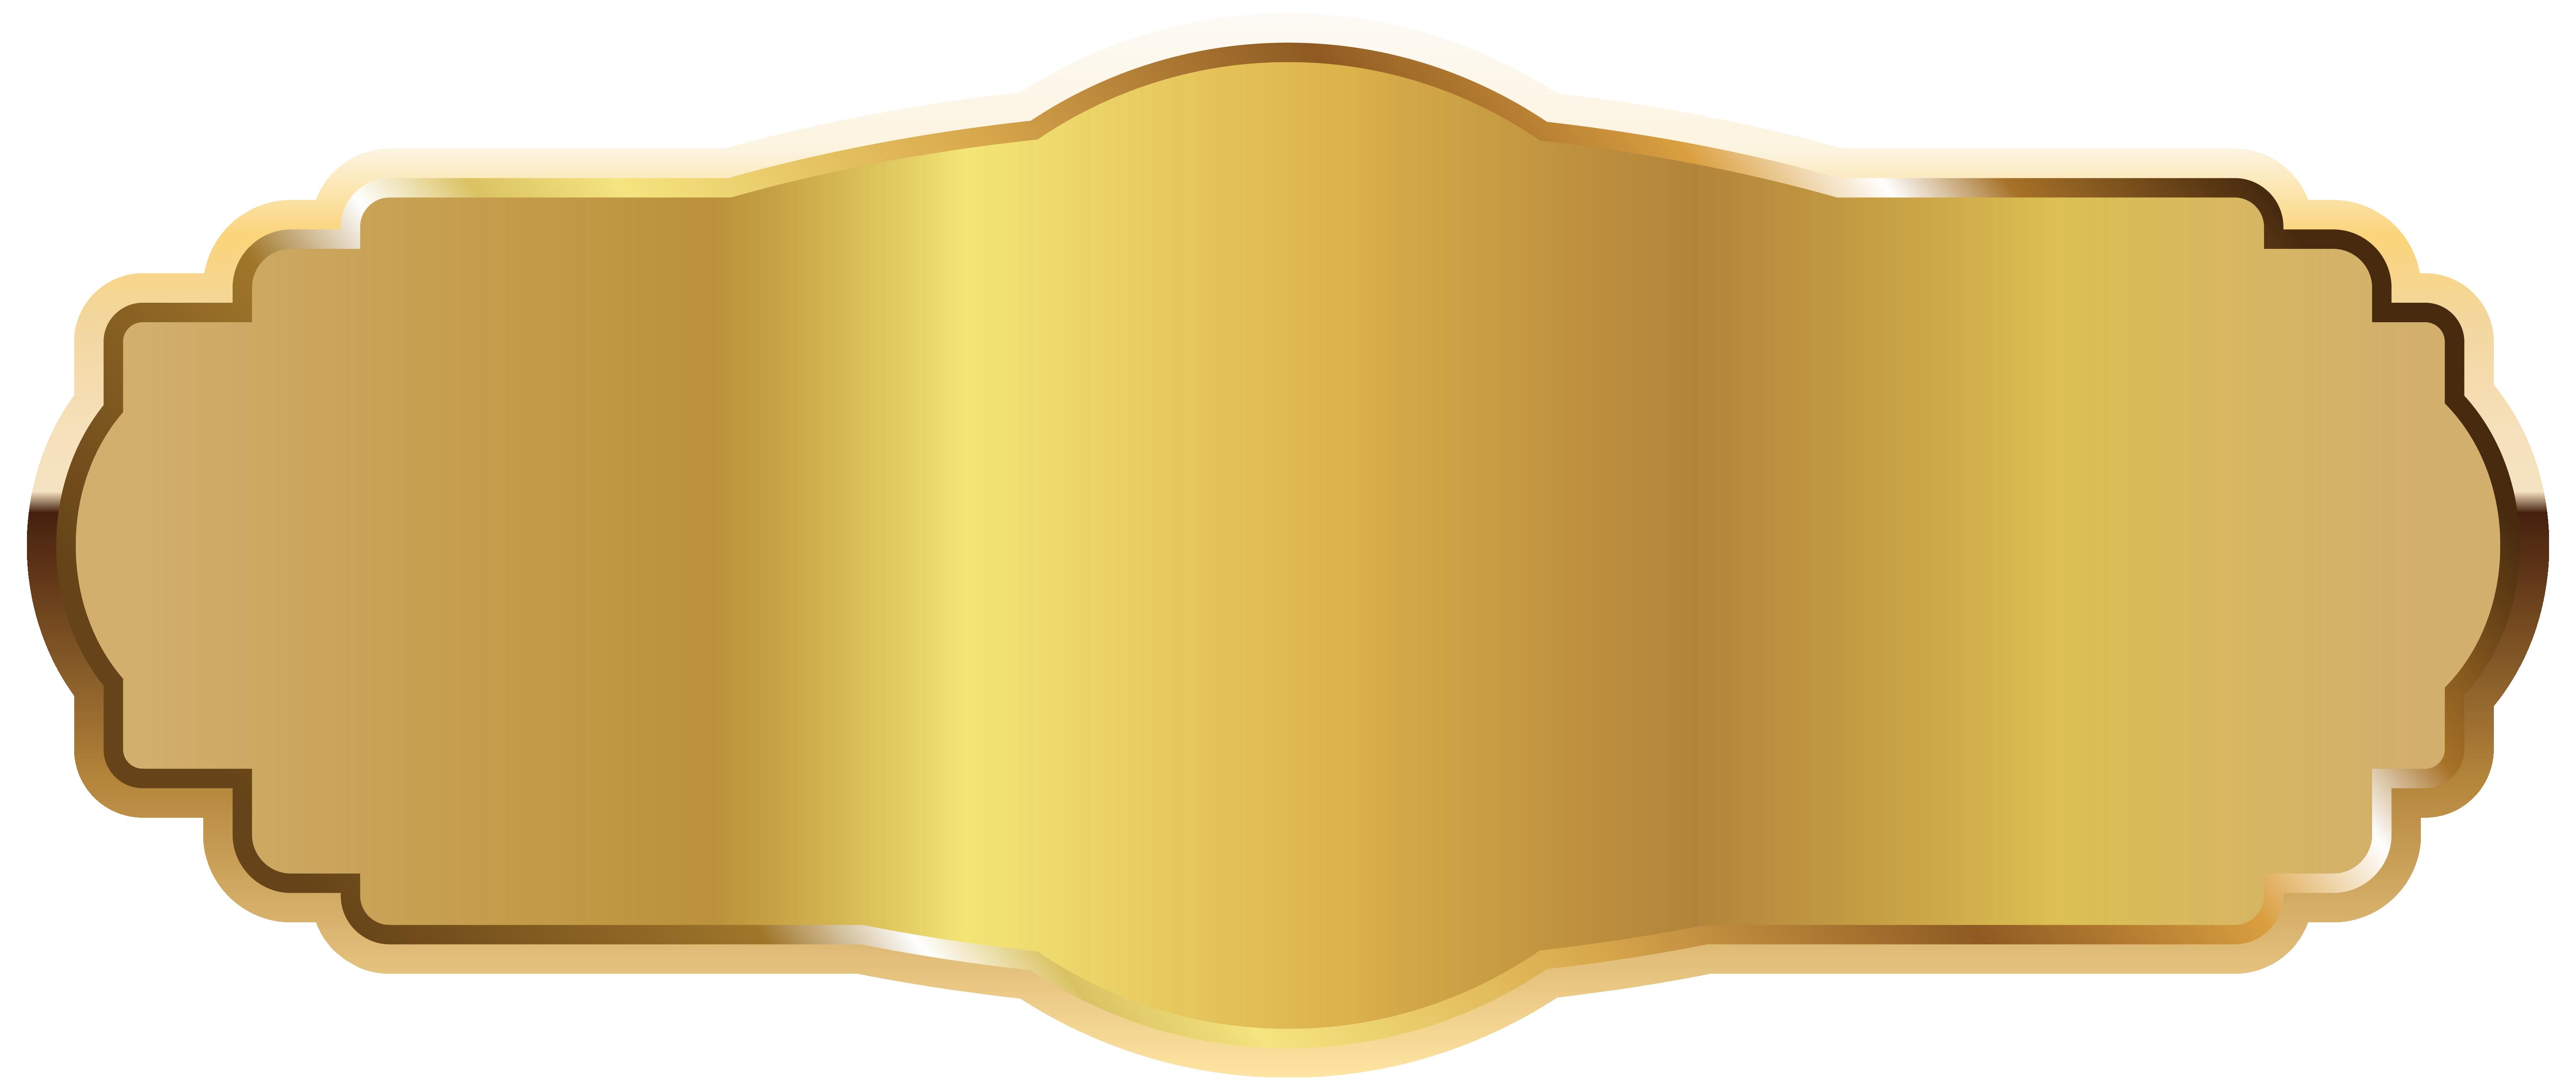 Gold Label Png Clipart Image Gold Labels Clip Art Photo Logo Design